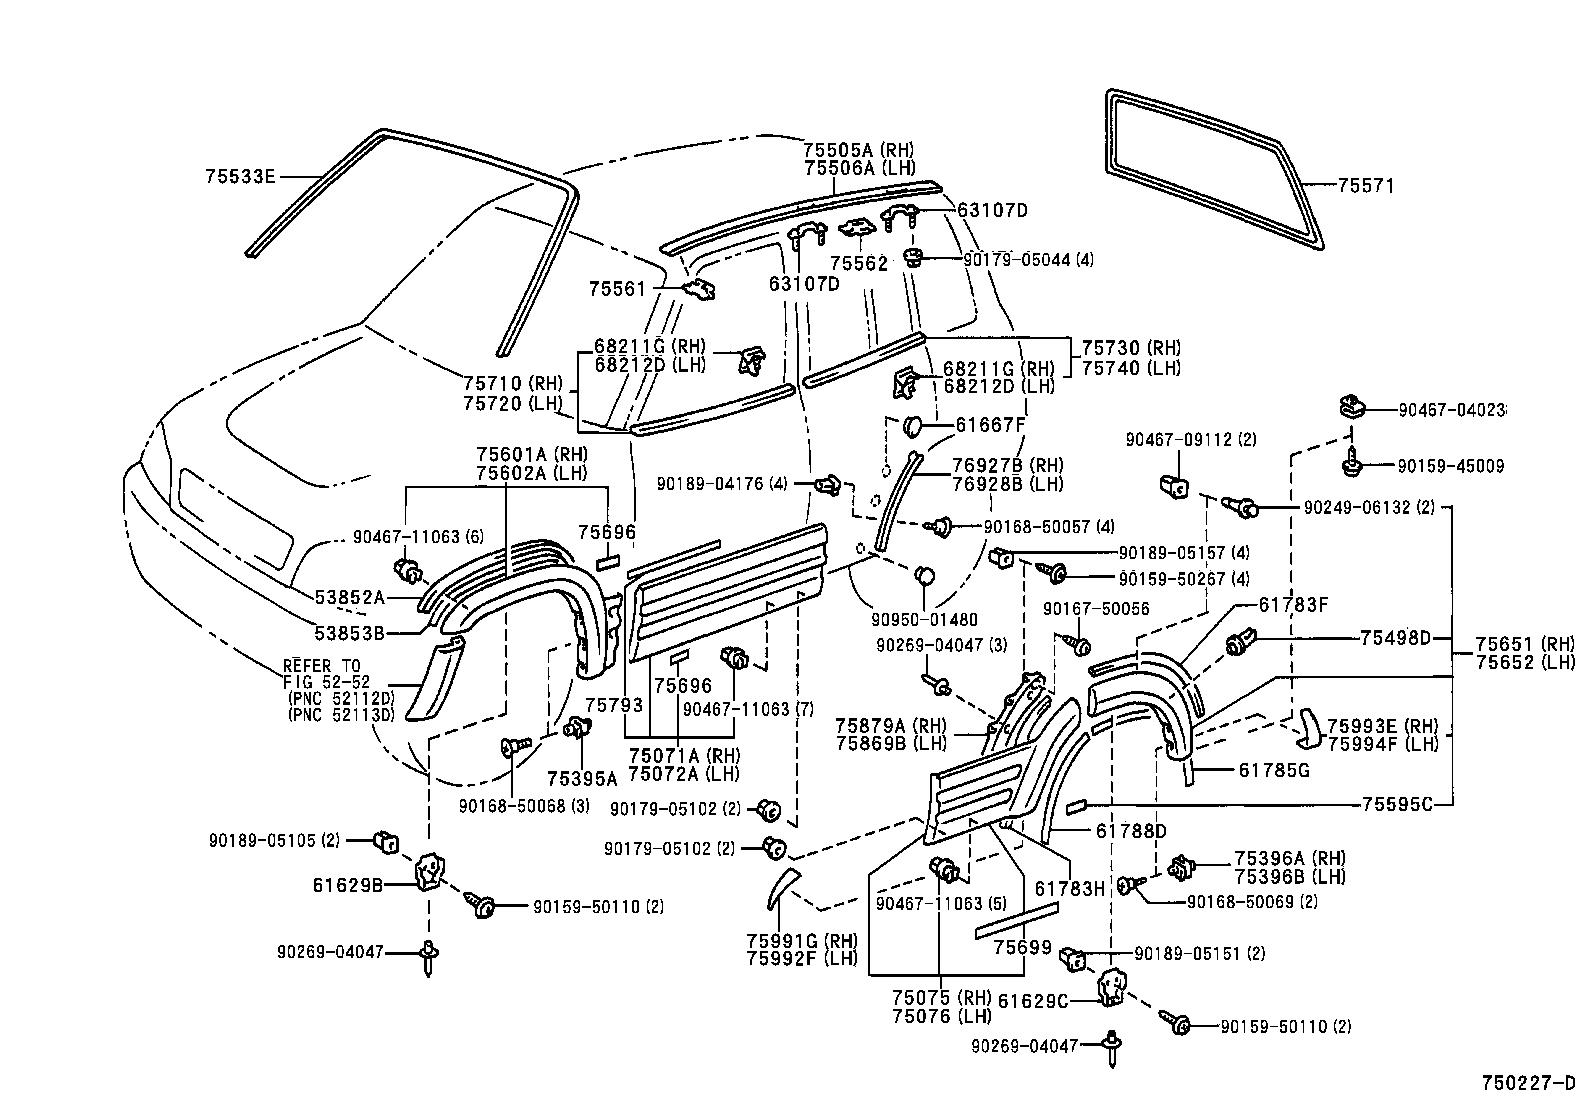 TO_6705] Toyota Rav4 Engine Diagram Schematic WiringSulf Arivo Lukep Pala Leona Ntnes Mohammedshrine Librar Wiring 101